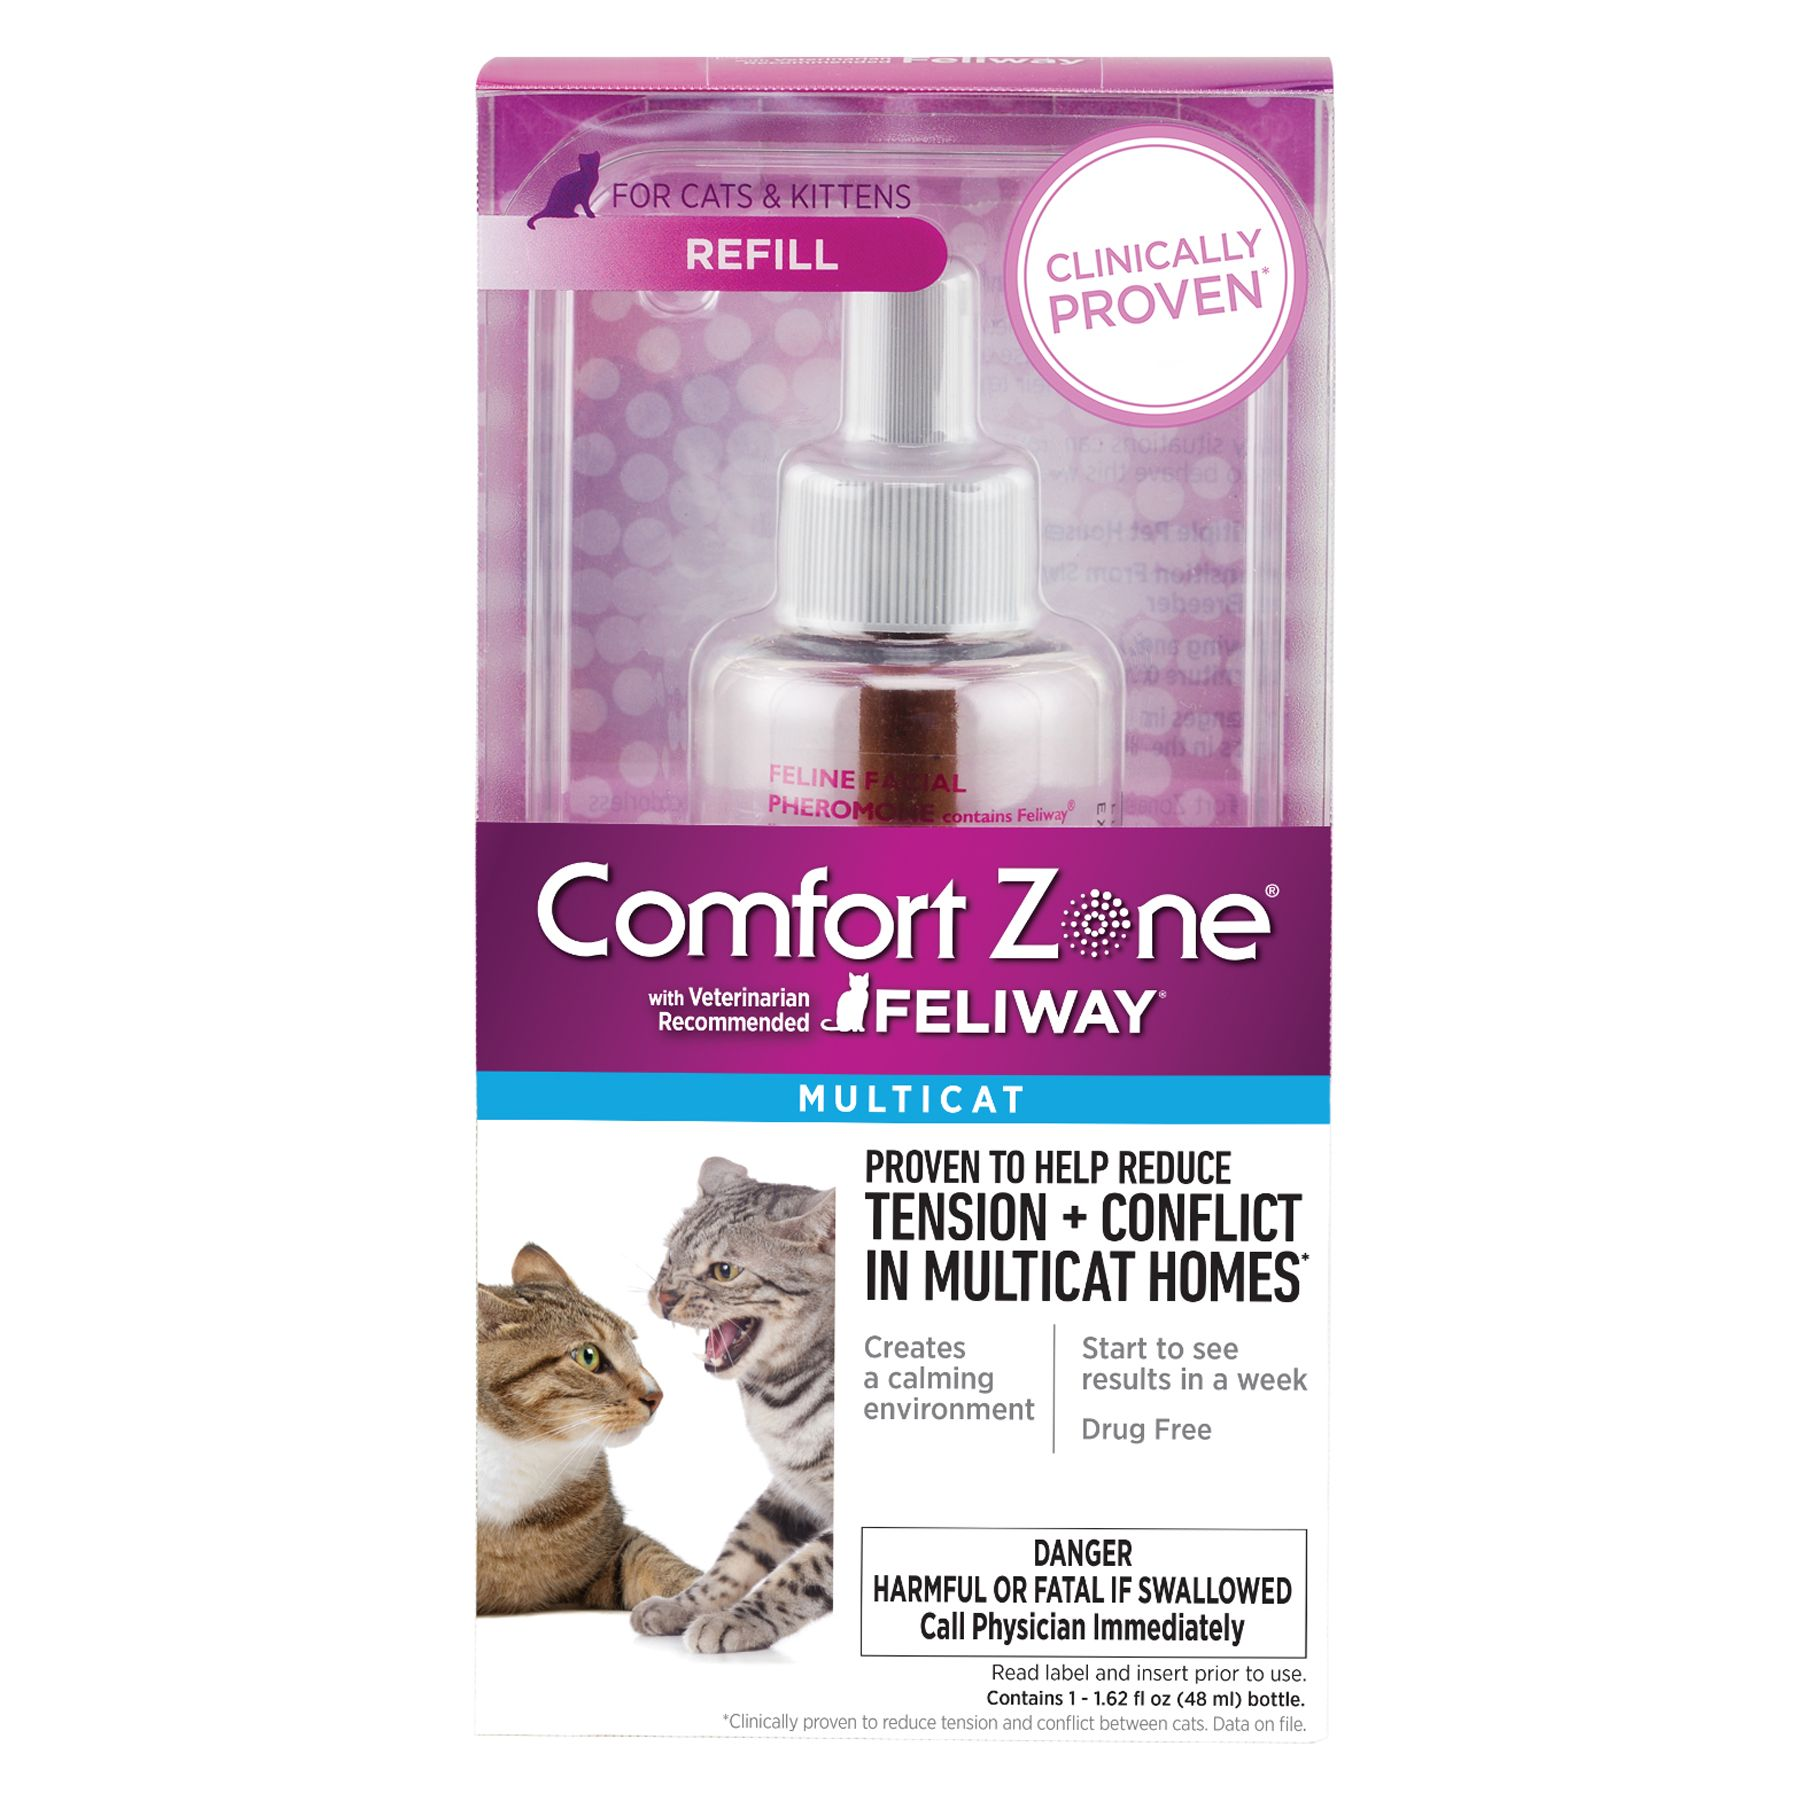 Comfort Zone Feliway Multicat Diffuser Refill